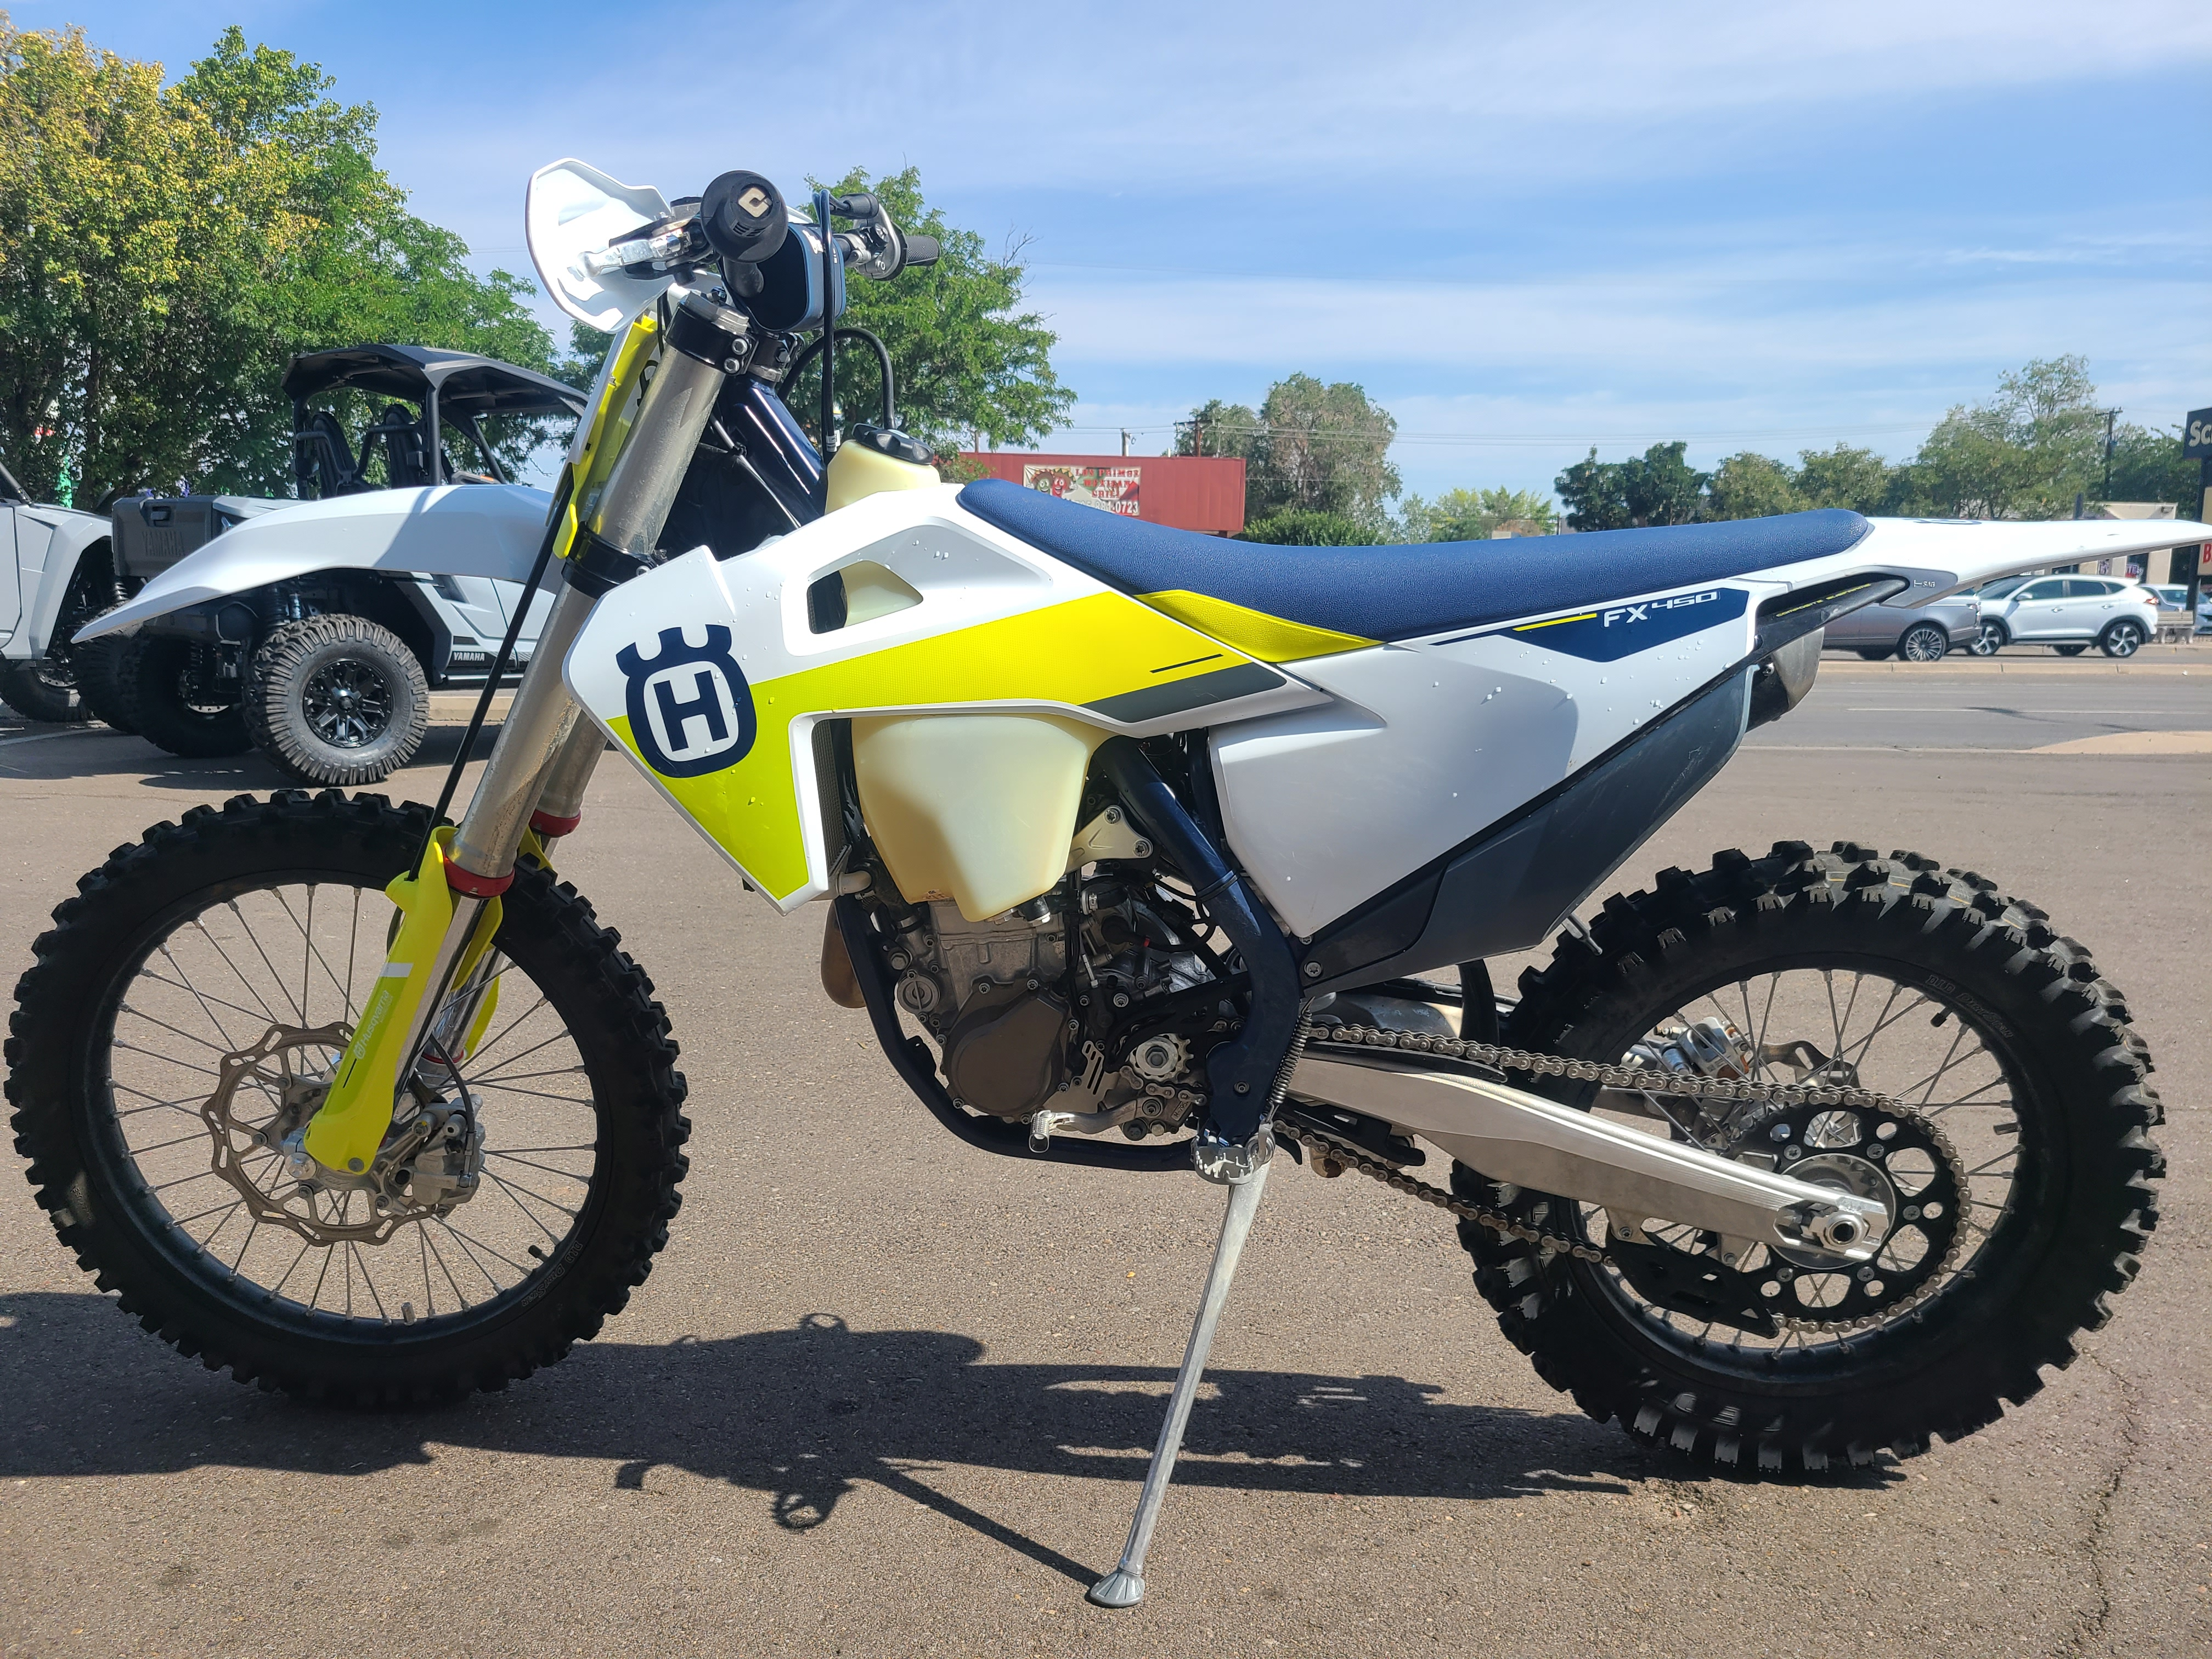 2021 Husqvarna FX 450 at Bobby J's Yamaha, Albuquerque, NM 87110